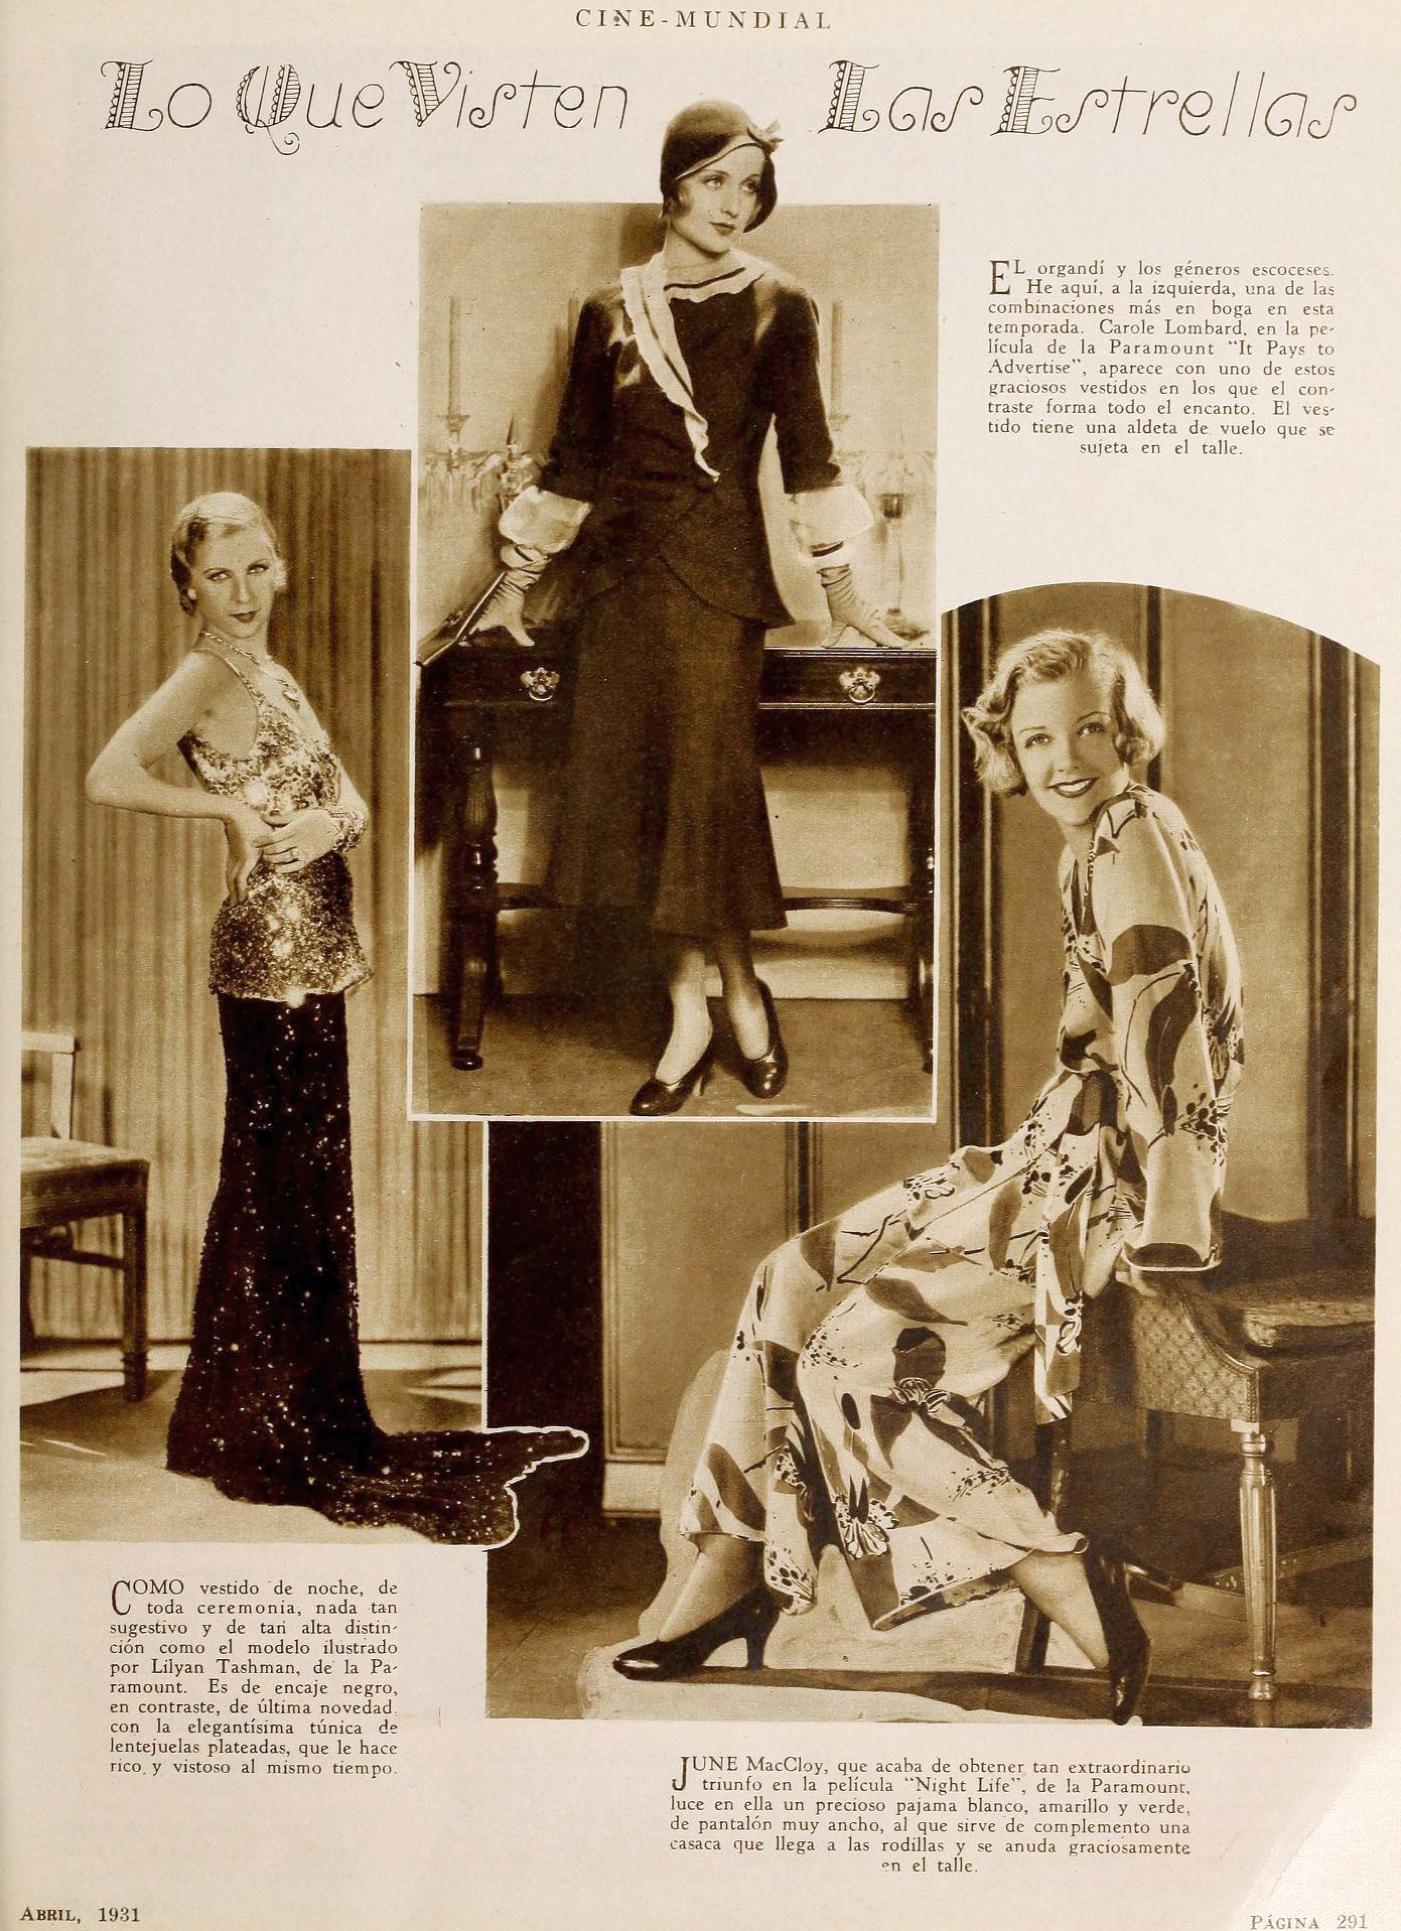 carole lombard cine mundial april 1931bb